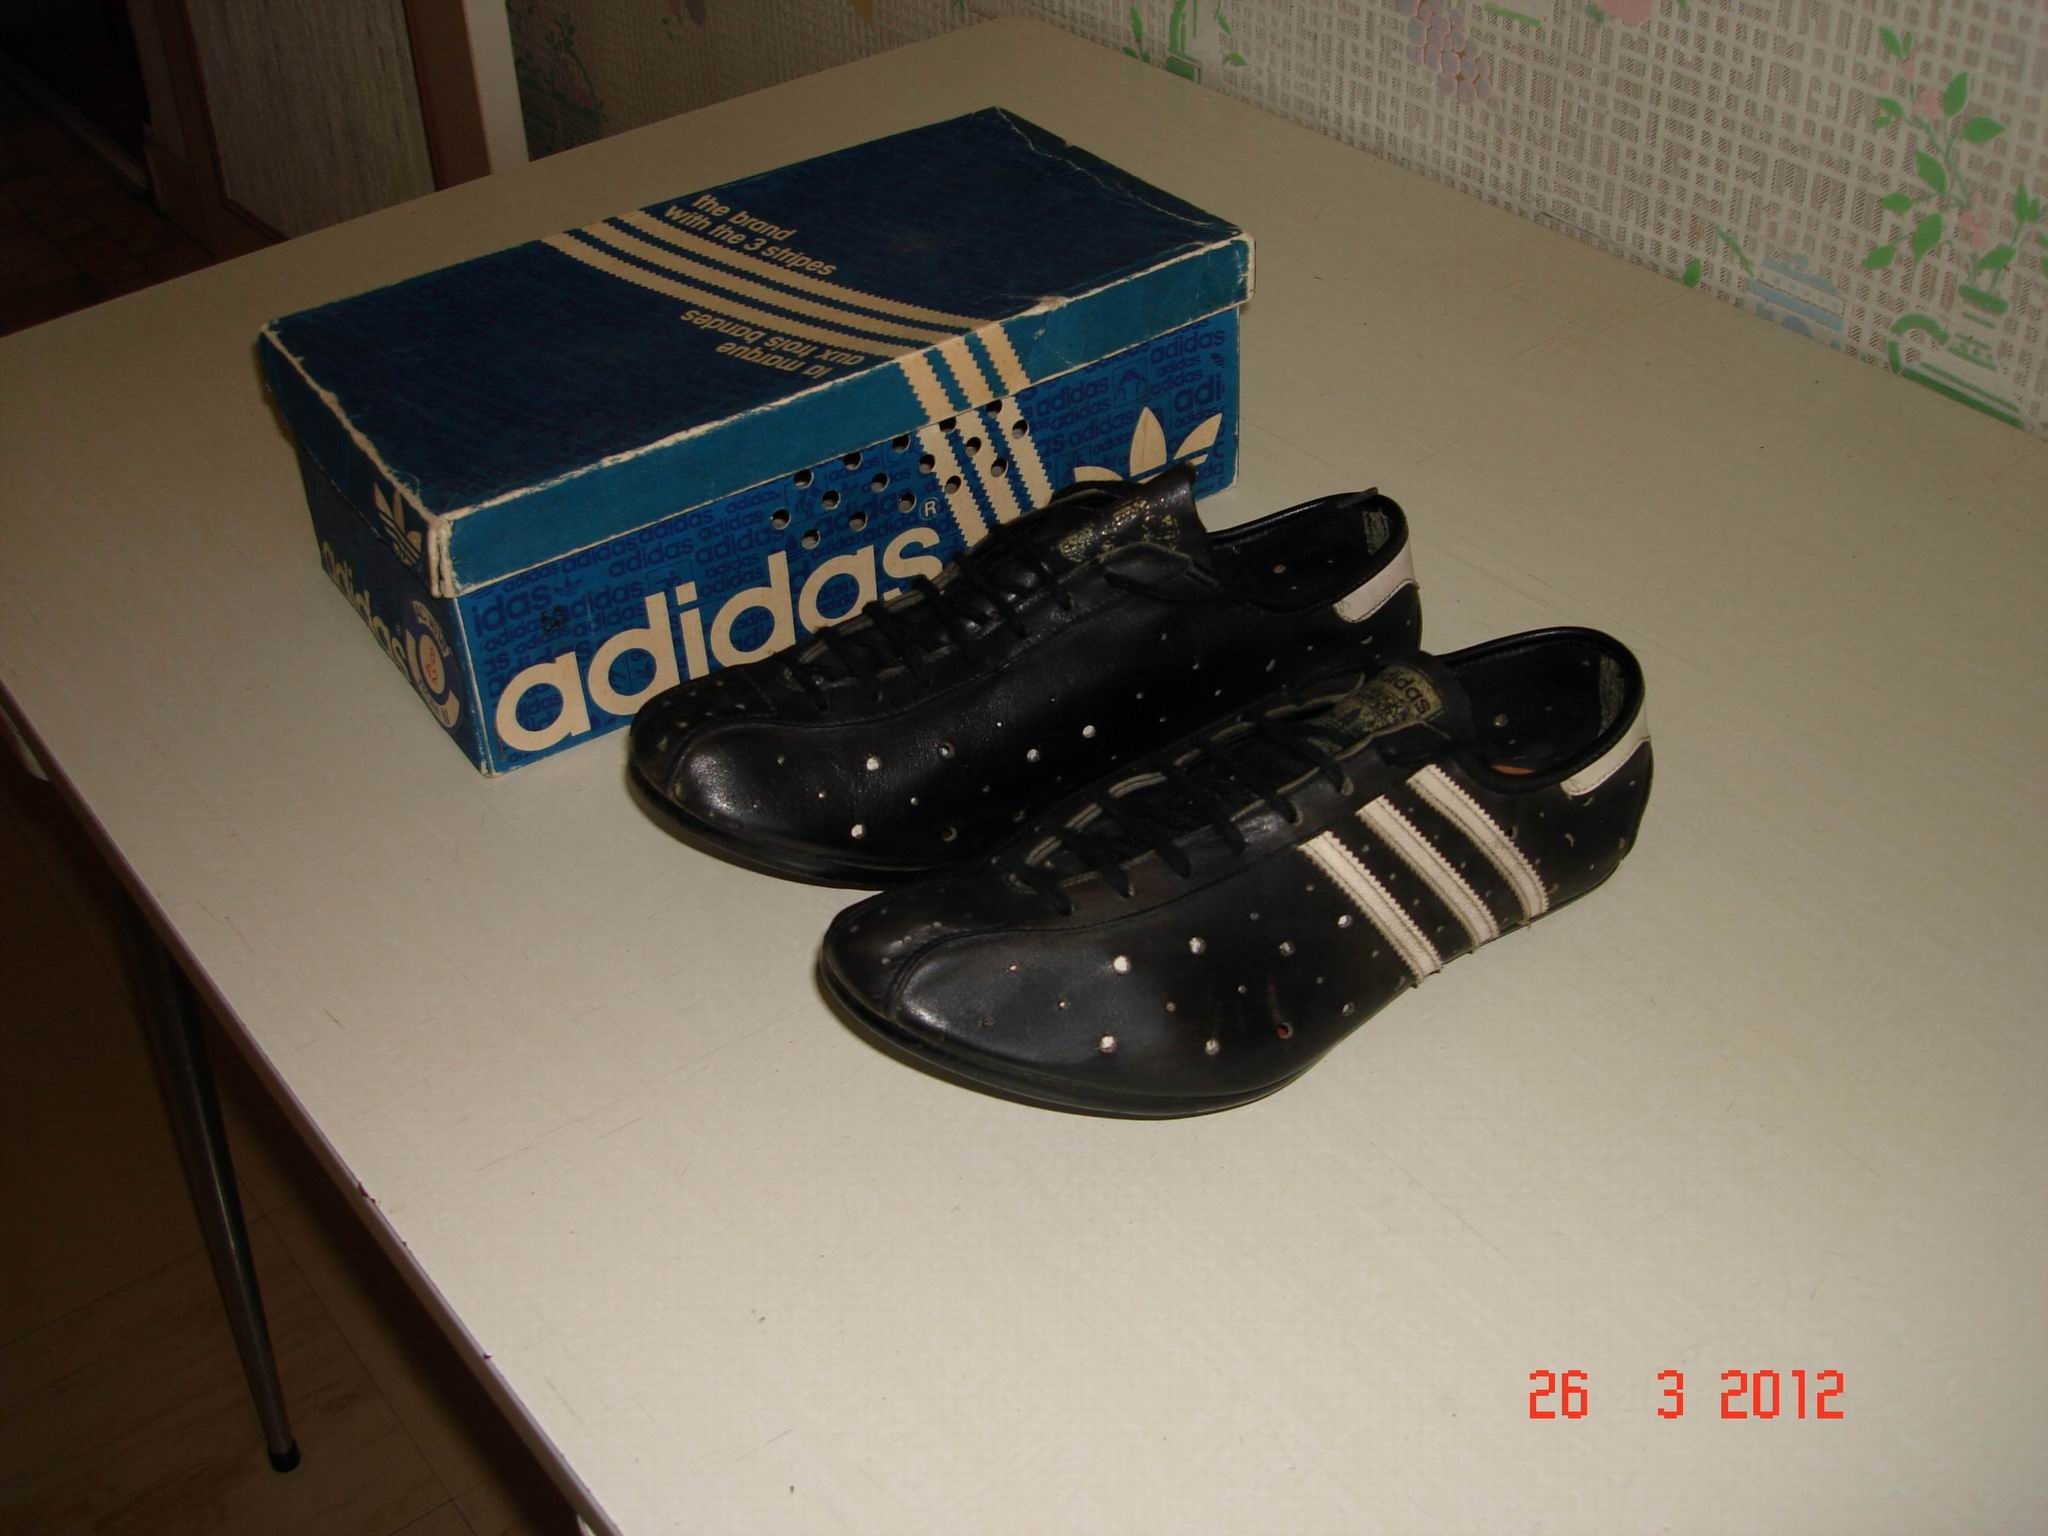 chaussure velo adidas vintage